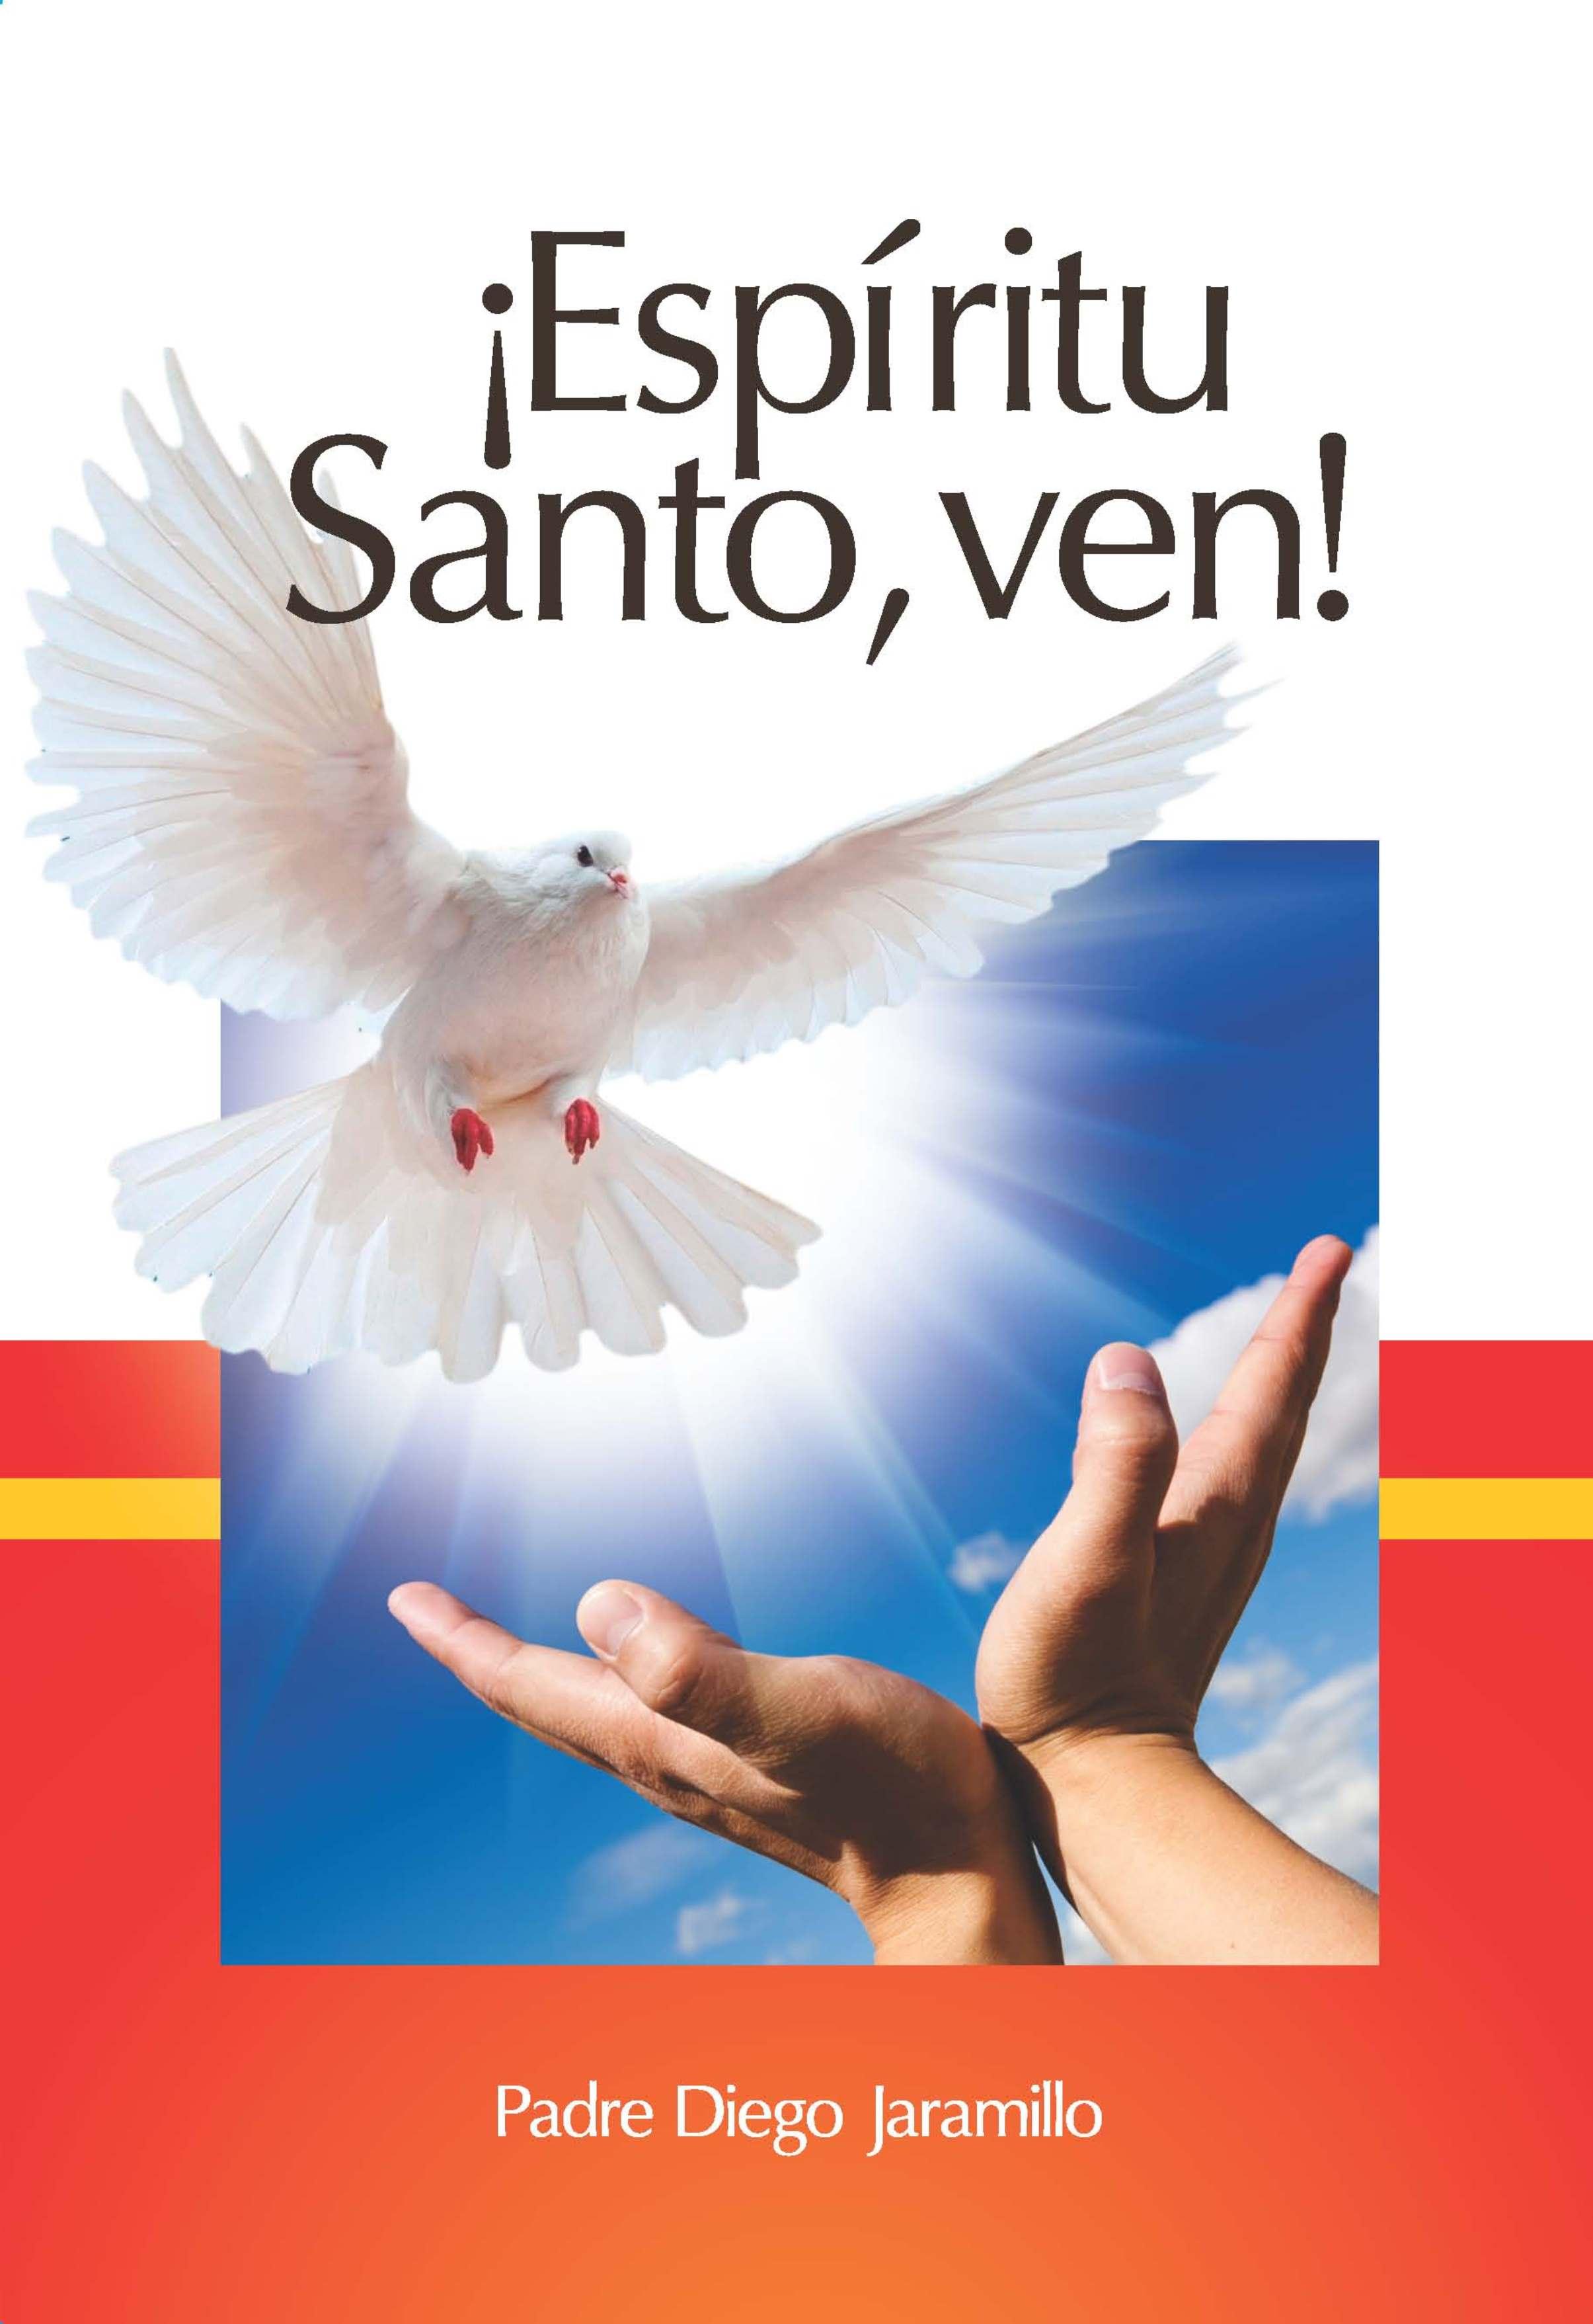 Diego Jaramillo Cuartas ¡Espíritu Santo, ven! ven a mi